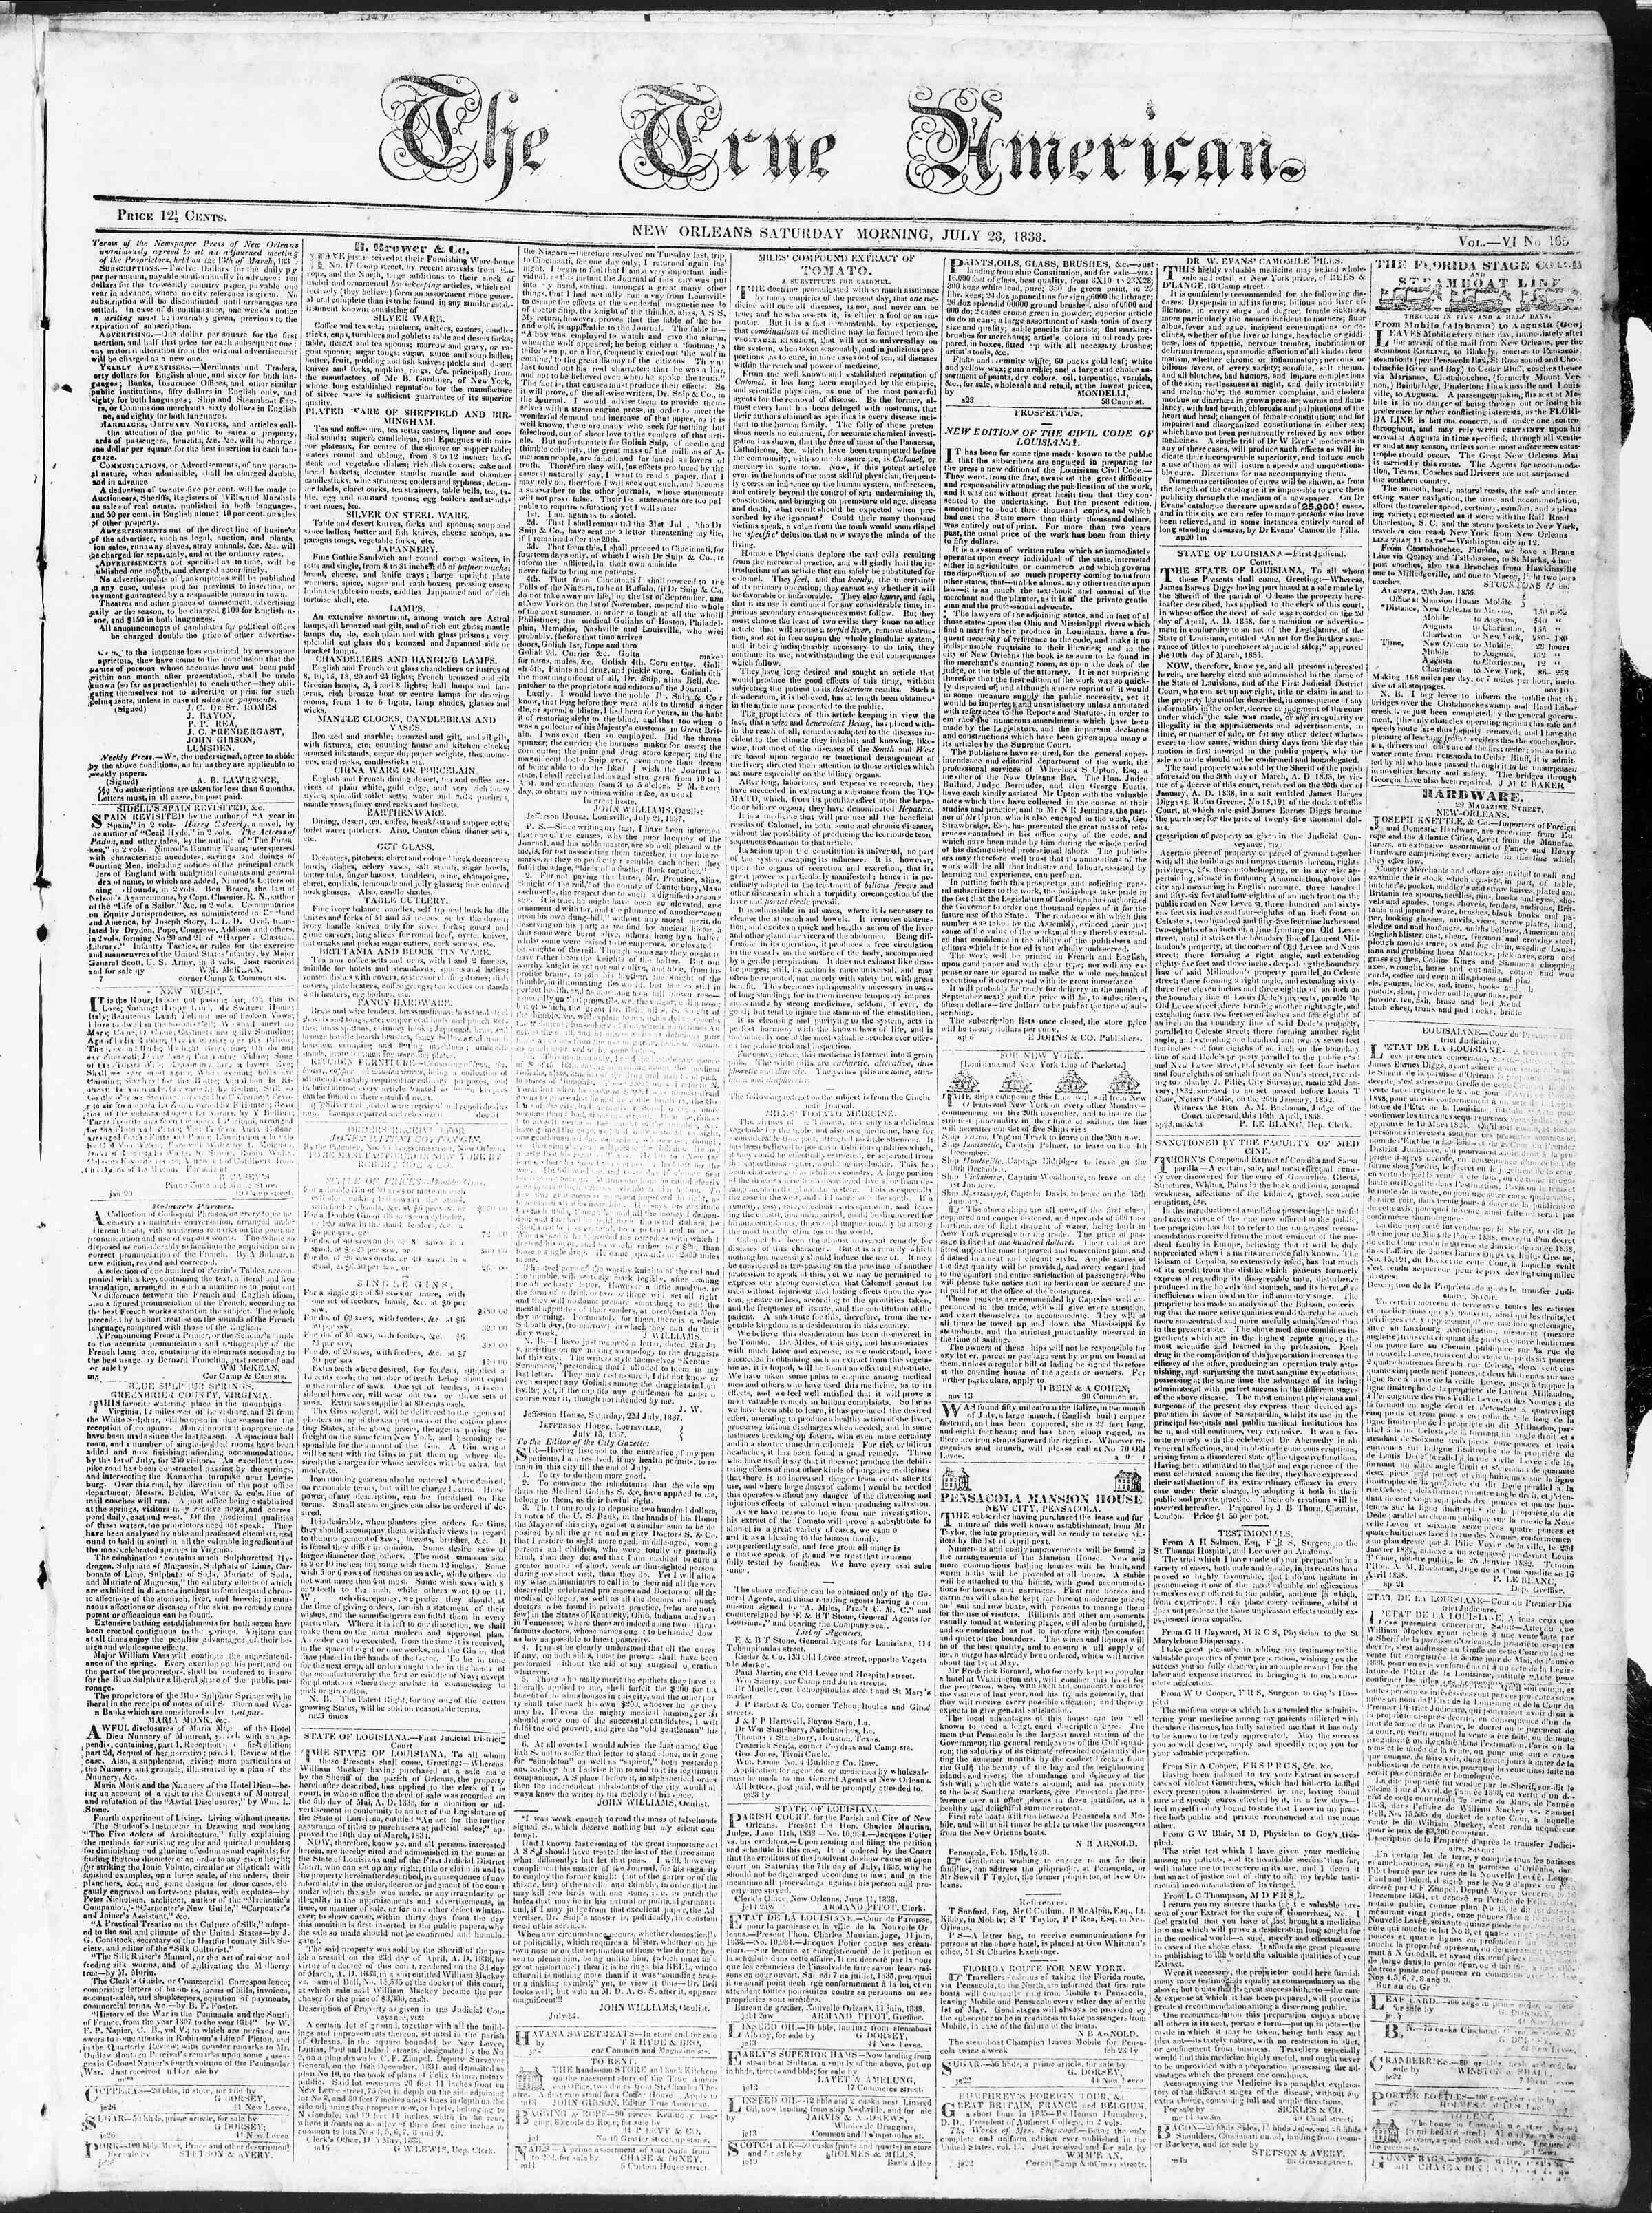 July 28, 1838 Tarihli True American Gazetesi Sayfa 1